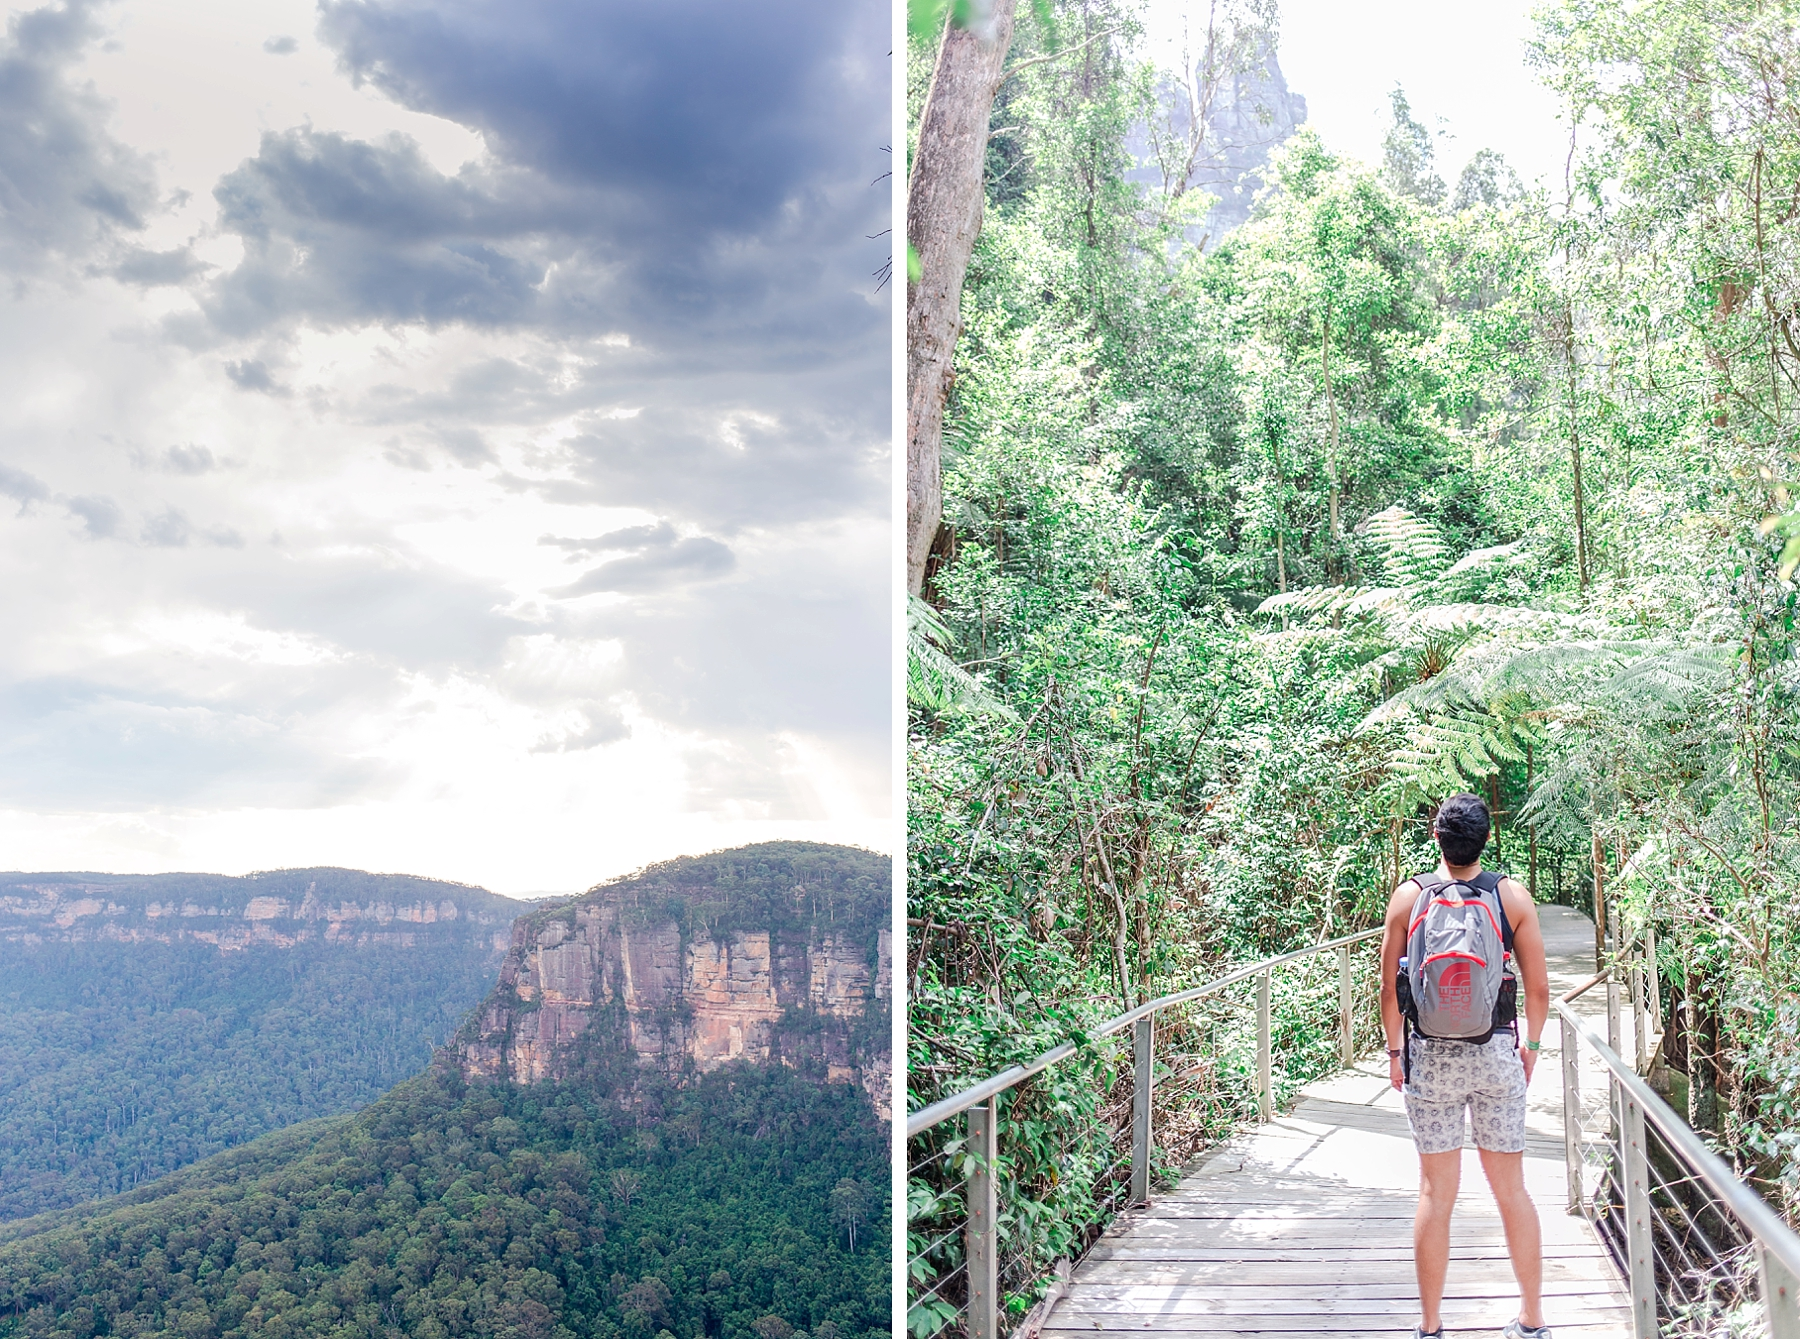 blue-mountains-australia-scenery_0134.jpg